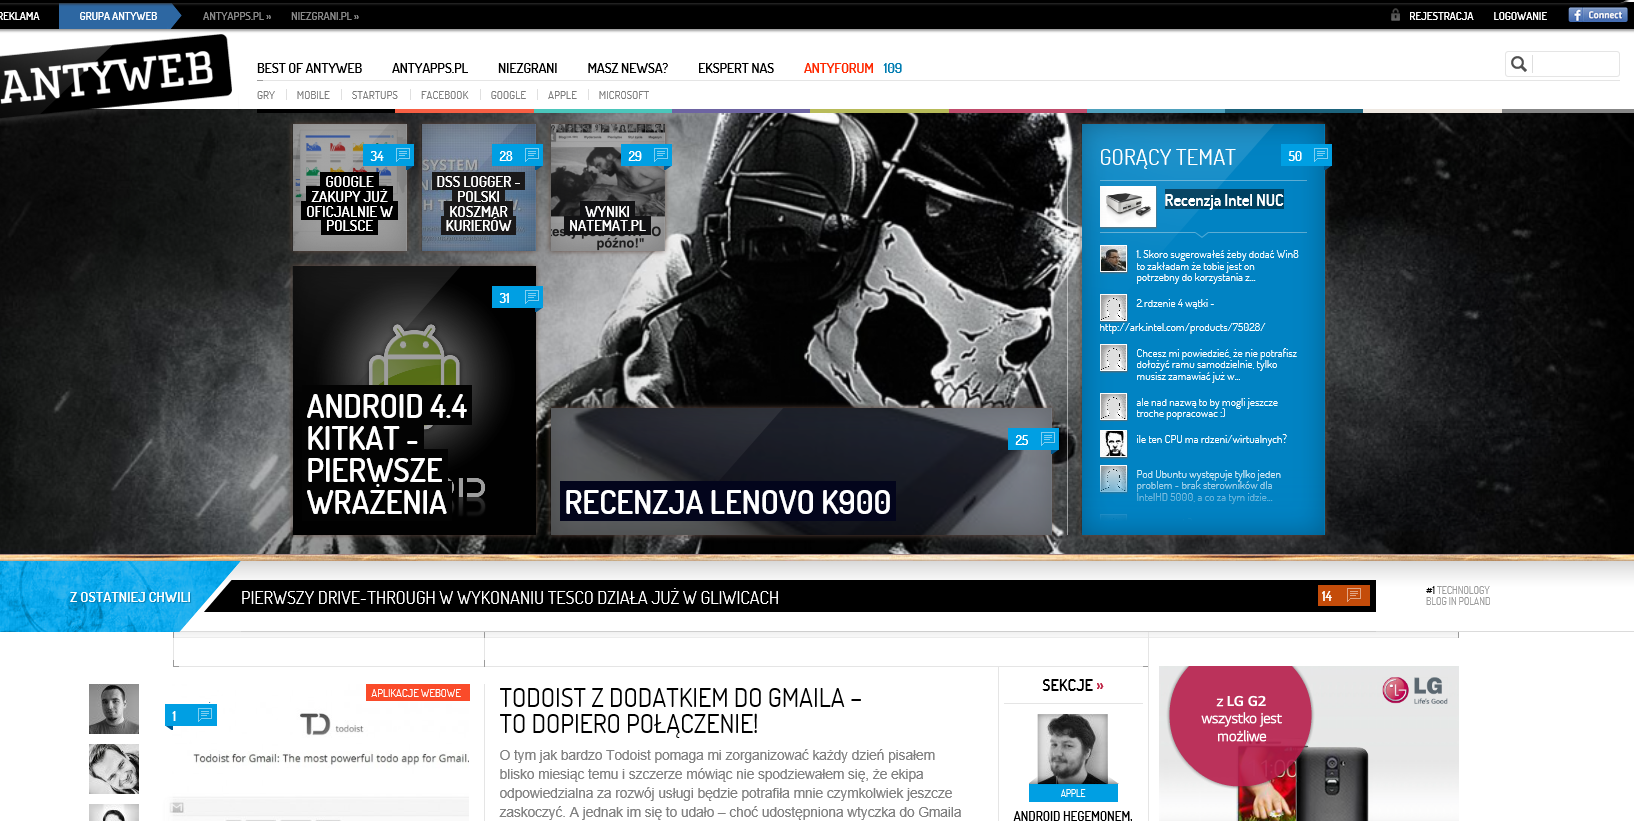 Screenshot (31)